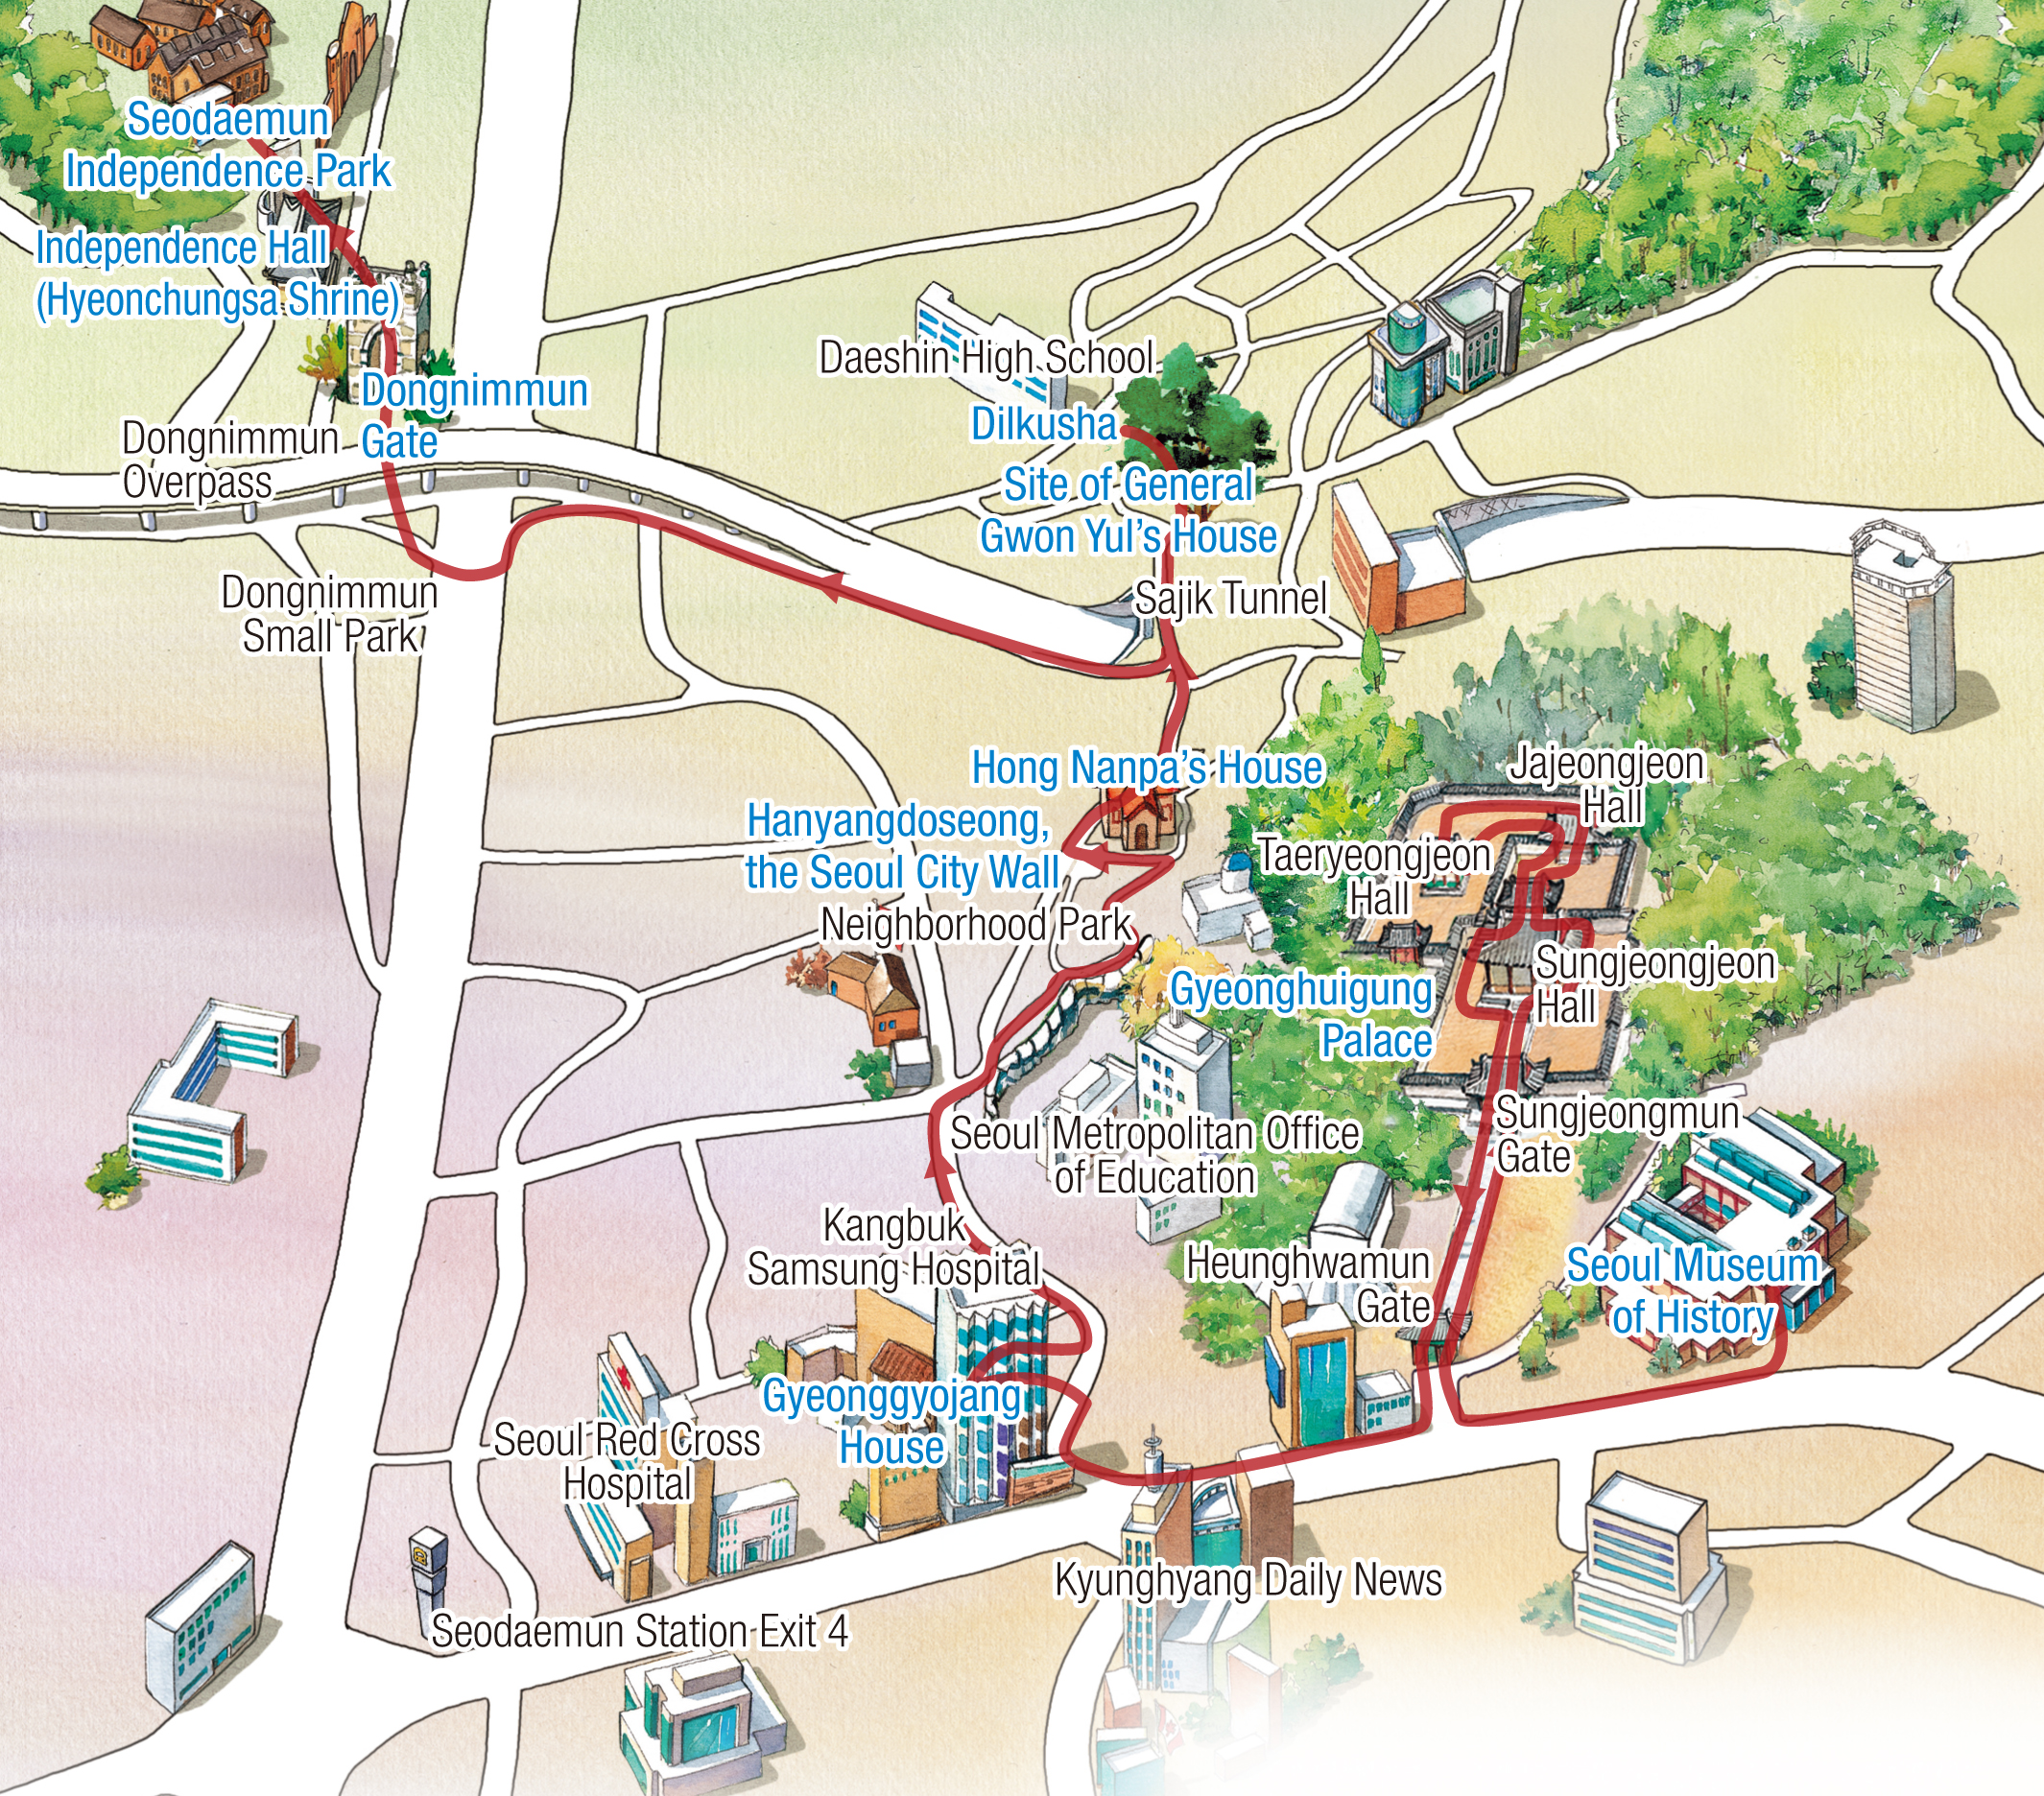 Map of Walking Tour Route : Seoul Museum of History - Gyeonghuigung - Donuimun Museum Village - Gyeonggyojang - Seoul City Wall - Hong Nanpa's House - Site of General Gwon Yul's House(Dilkusha) - Dongnimmun - Dongnipgwan (Hyeonchungsa) - Seodaemun Independence Park